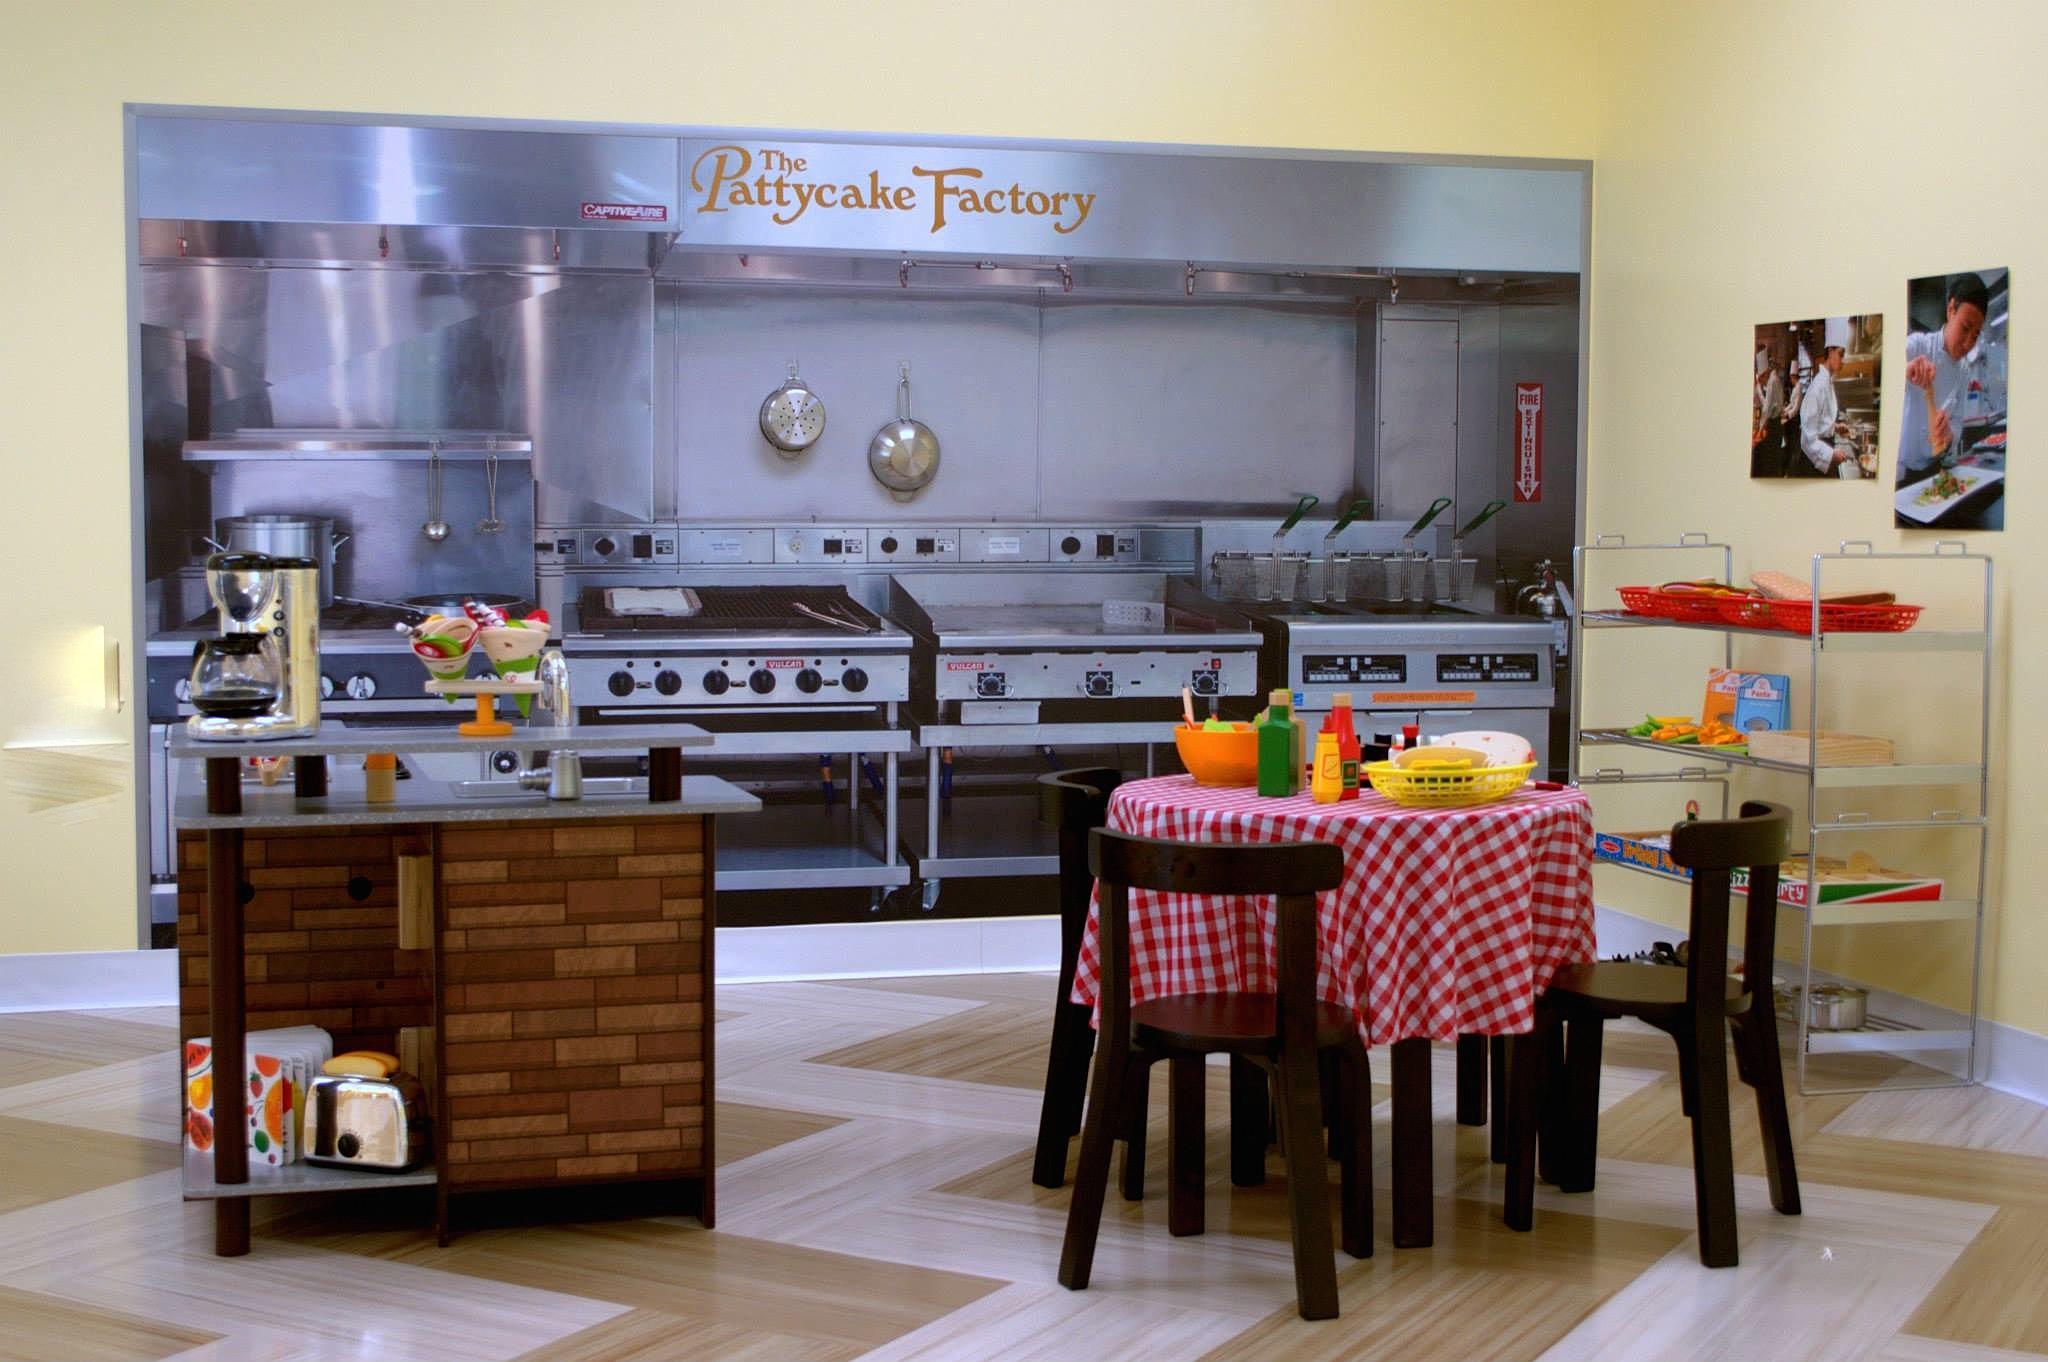 Preschool Kitchen Furniture Contact Us Preschool Coral Gables Vca Preschool Coral Gables